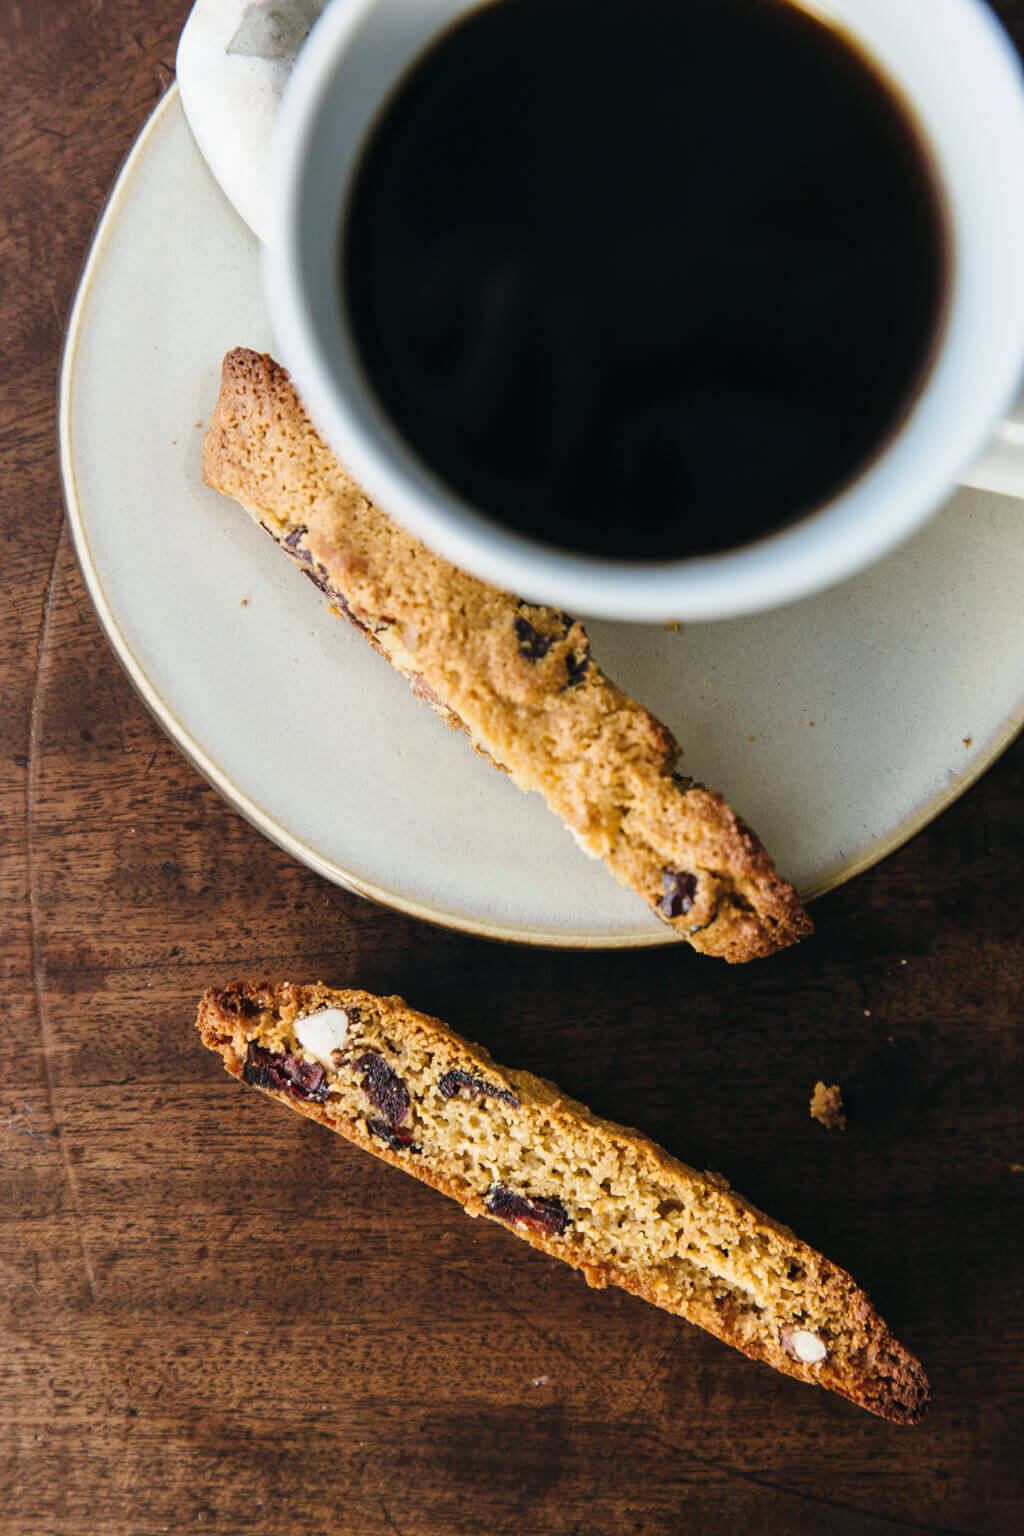 Cranberry almond biscotti. Gluten-free, grain-free and paleo.